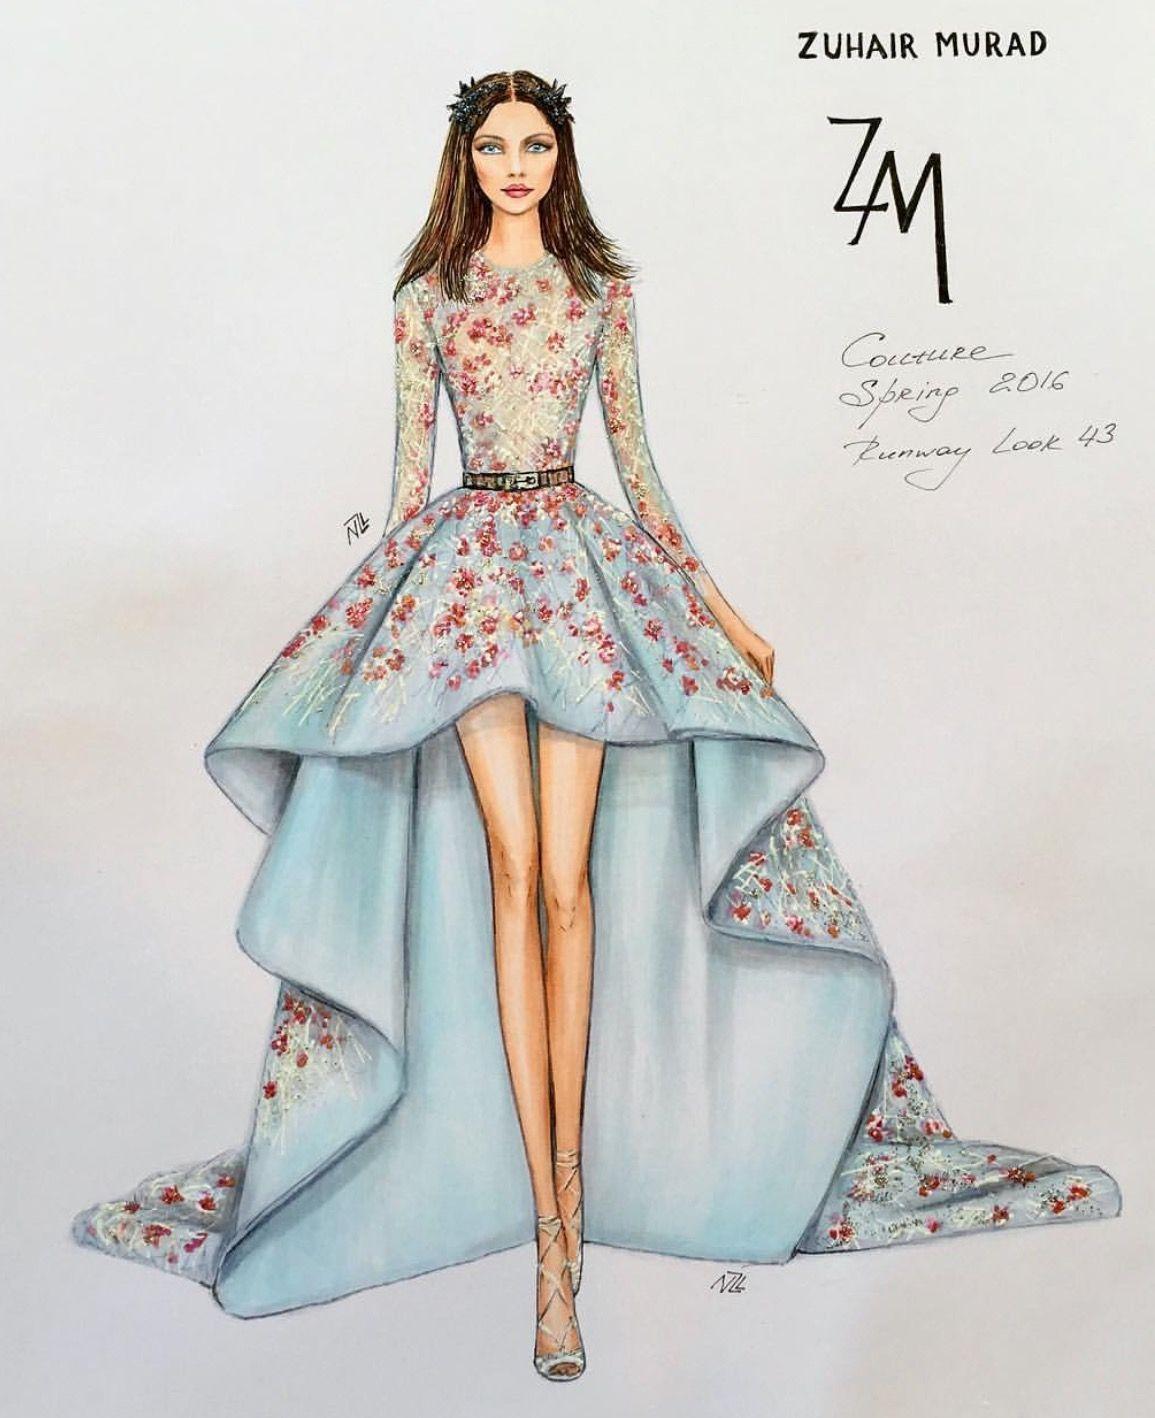 Nataliazorinliu be inspirational mz manerz being well dressed is  also best dress images costume design drawing fashion rh pinterest